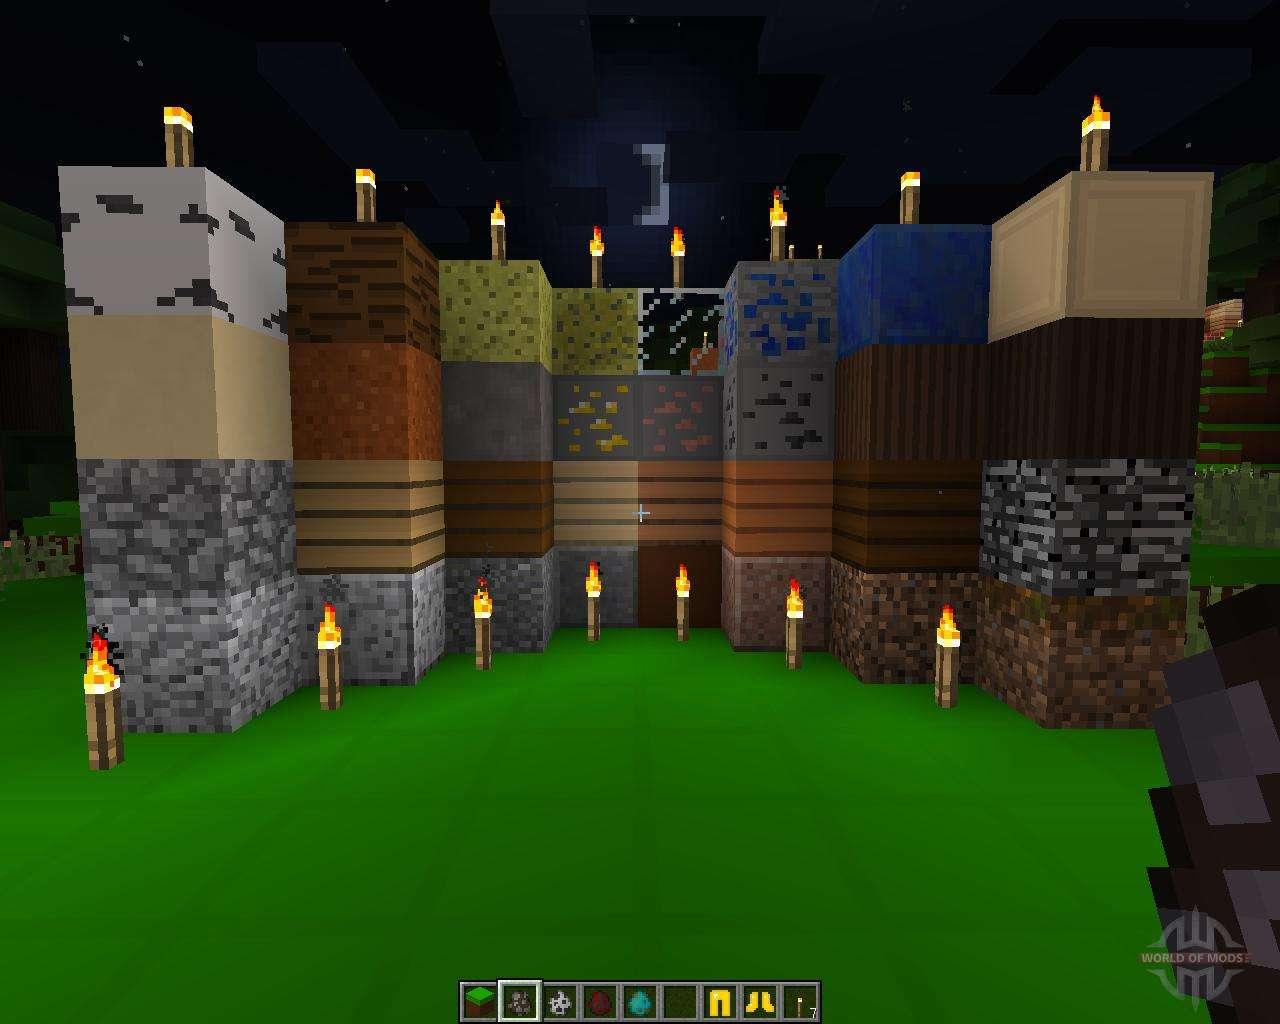 Скачать шейдеры Майнкрафт - Minecraft шейдеры 1.12, 1.11.2 ...